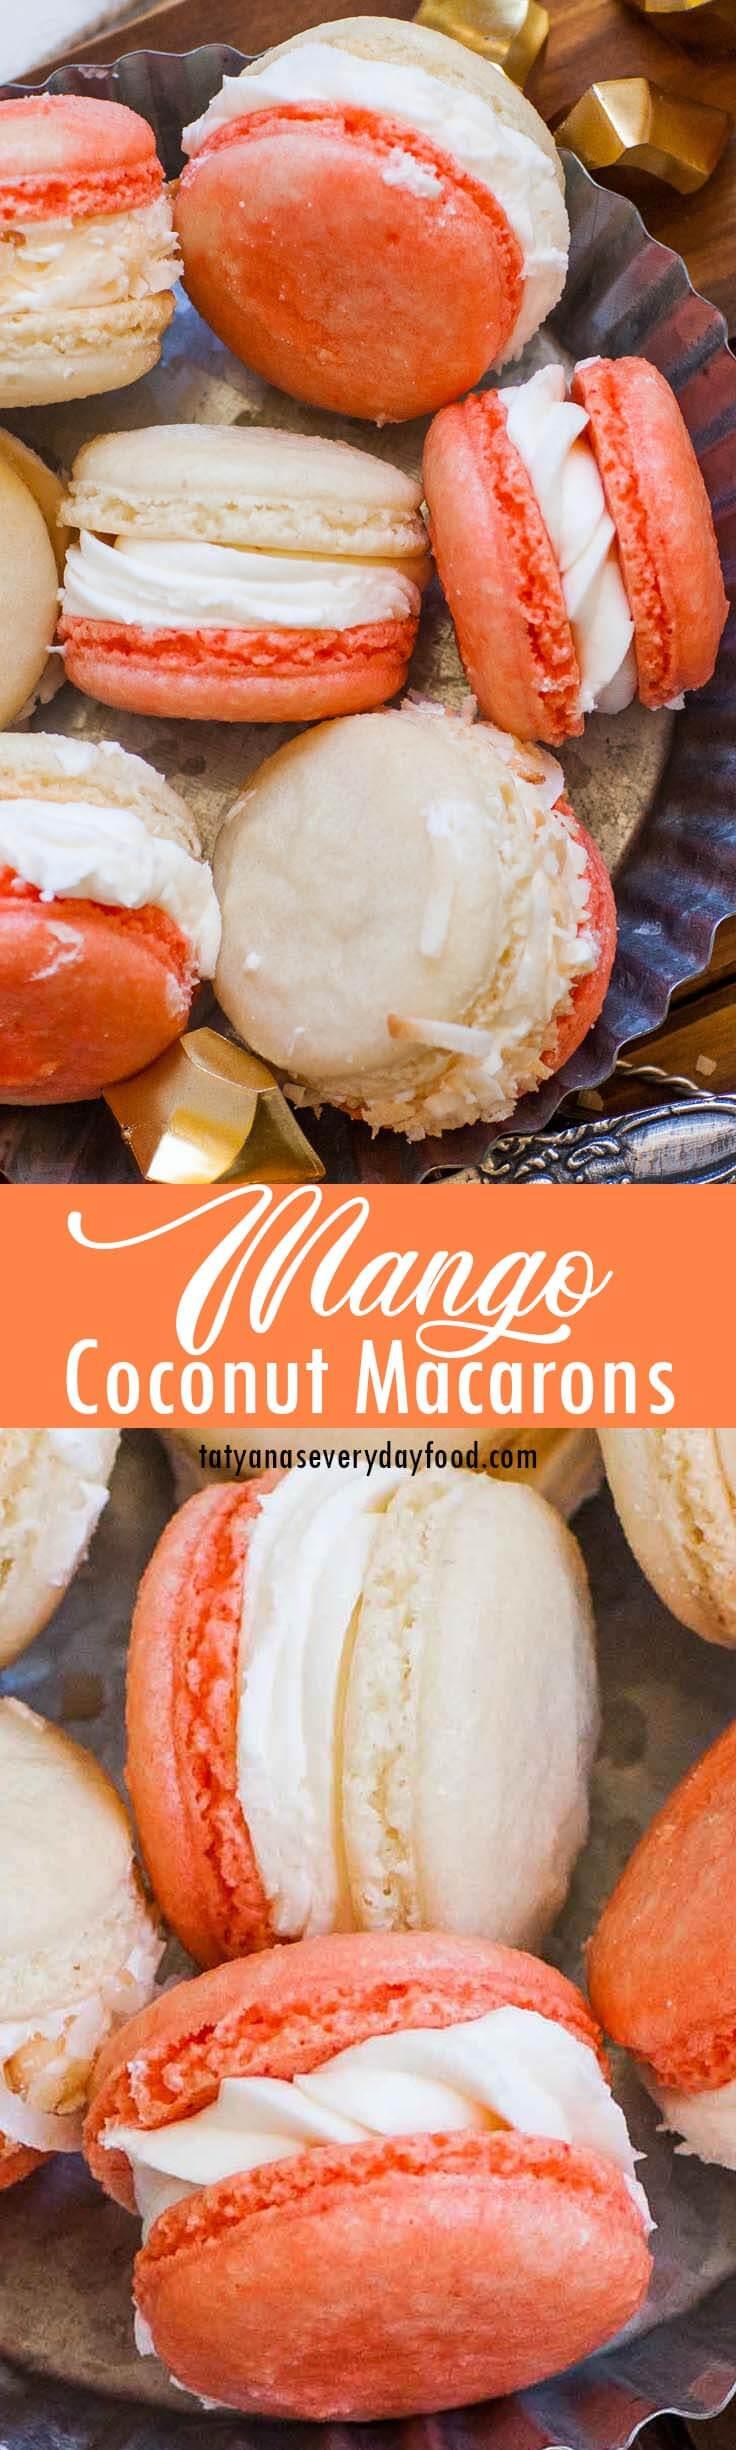 Coconut Mango Macarons video recipe 2